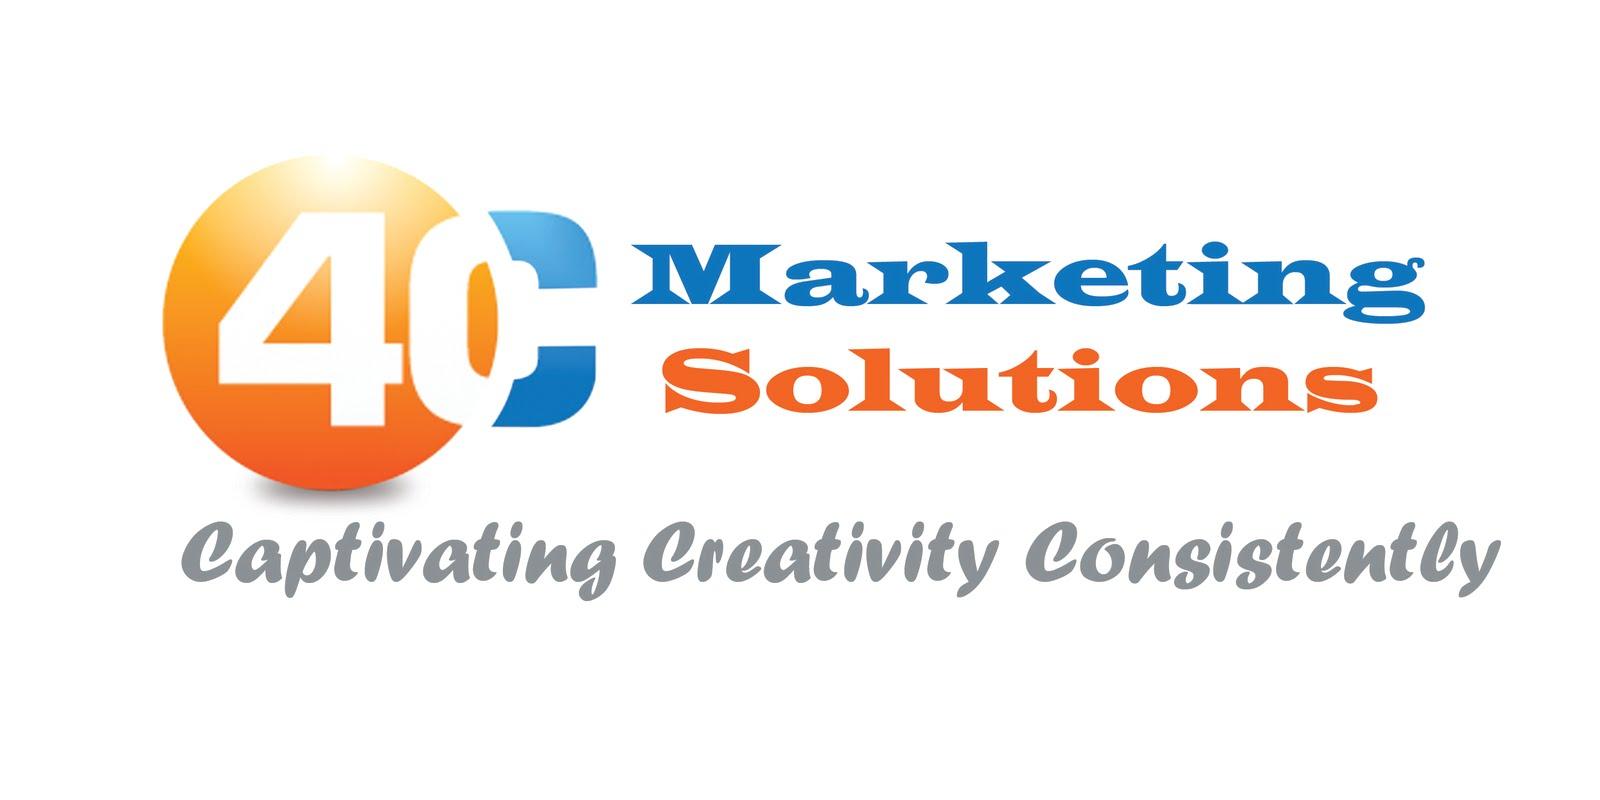 4cs marketing solutions